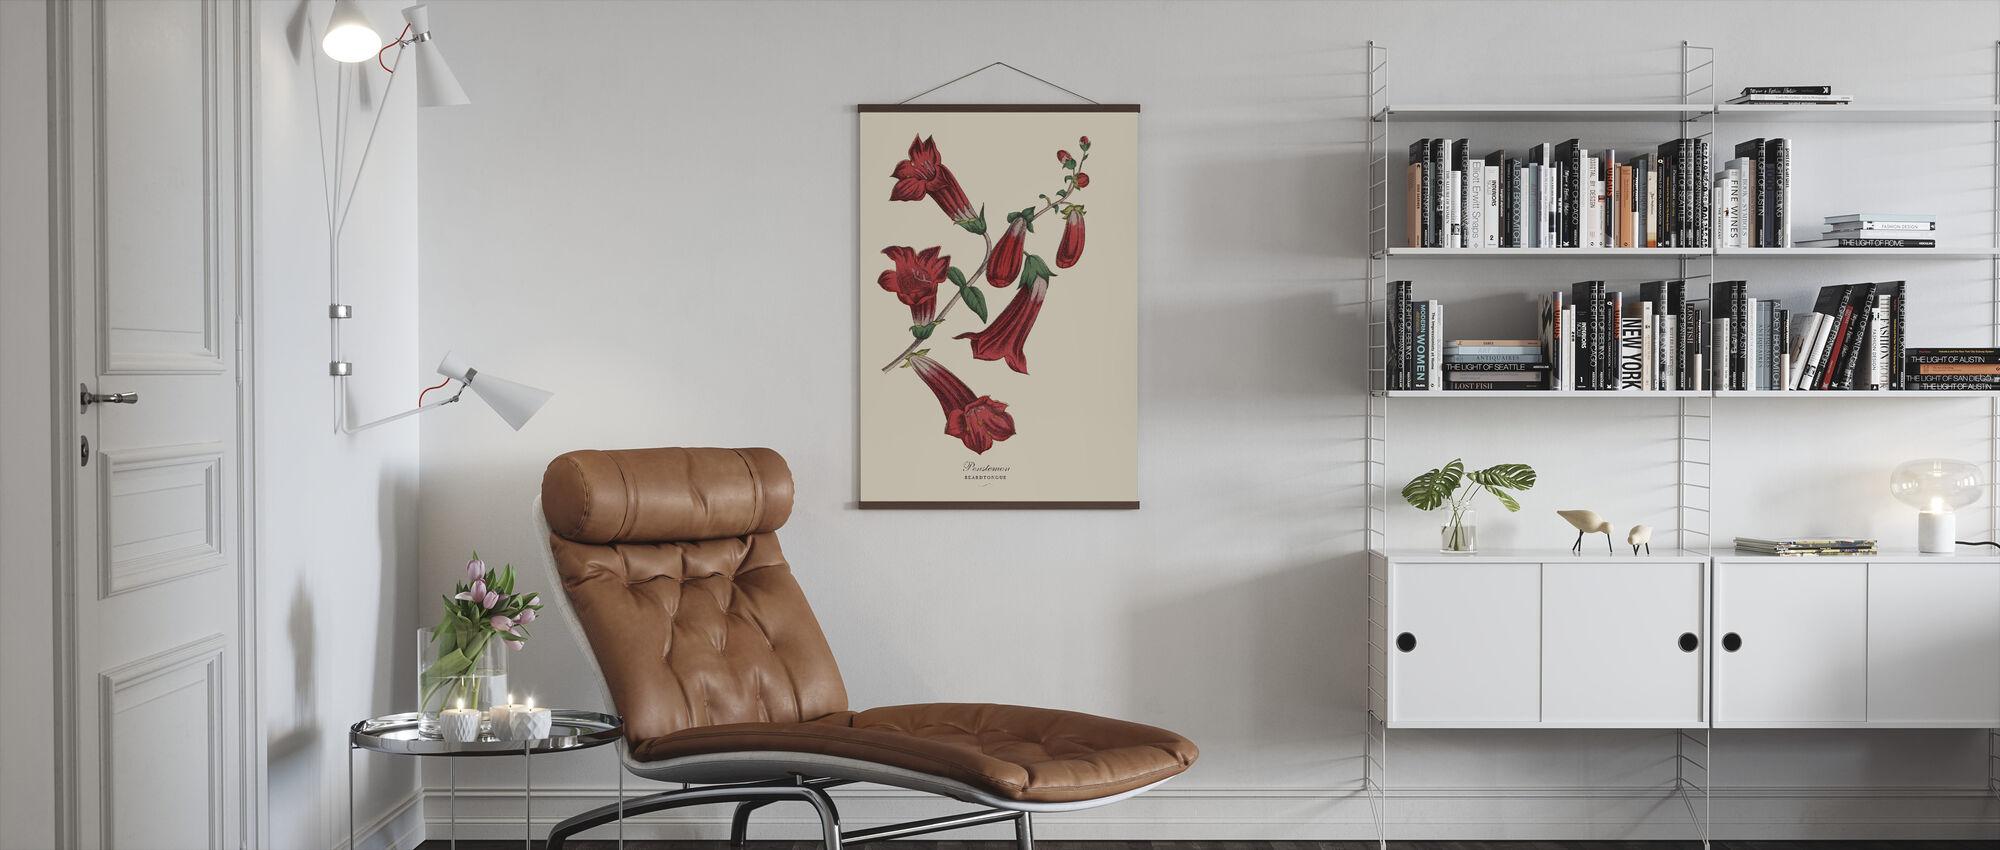 Beardtongue Plant - Poster - Living Room